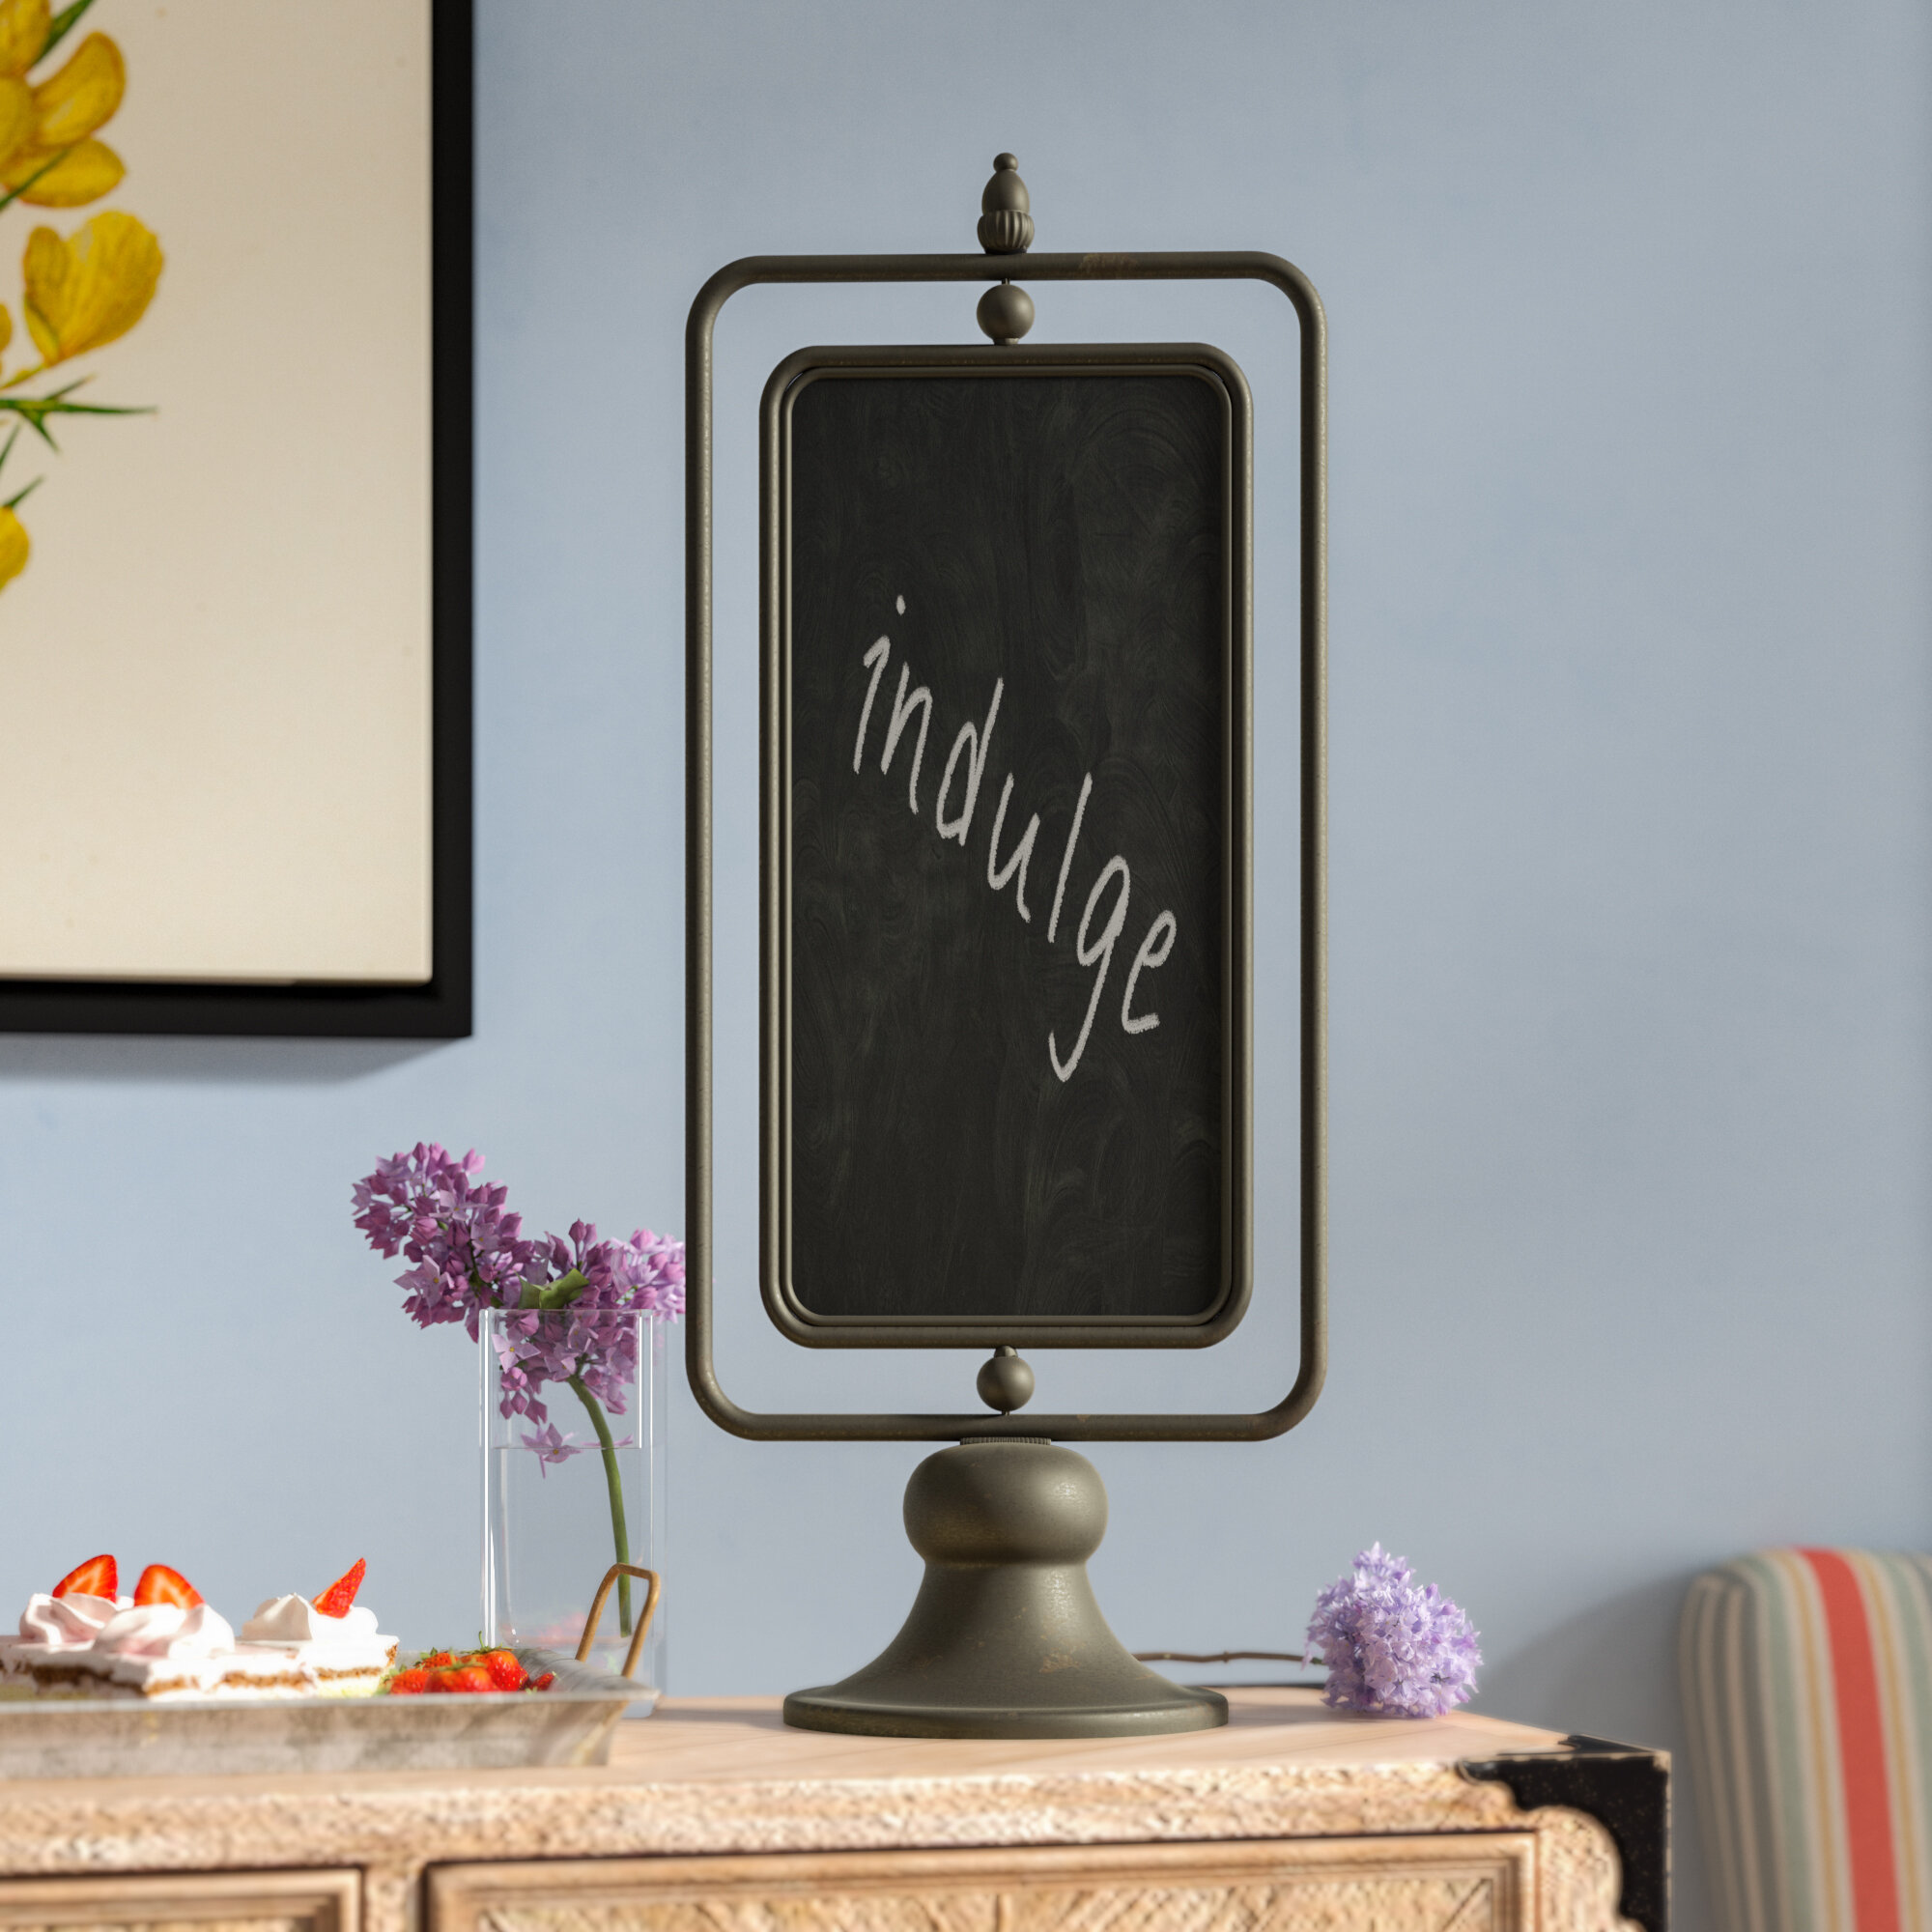 Laurel Foundry Modern Farmhouse Metal Free Standing Chalkboard | Wayfair